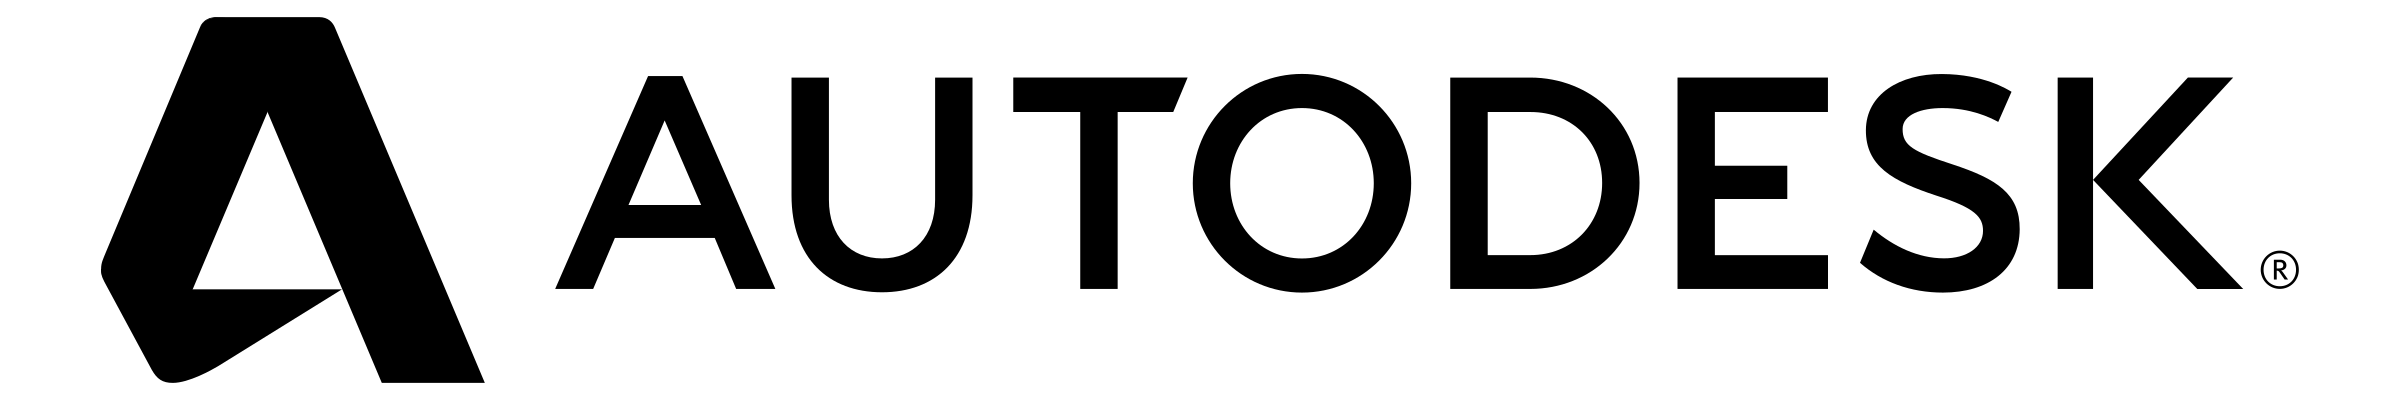 Autodesk Logo PNG Transparent & SVG Vector - Freebie Supply